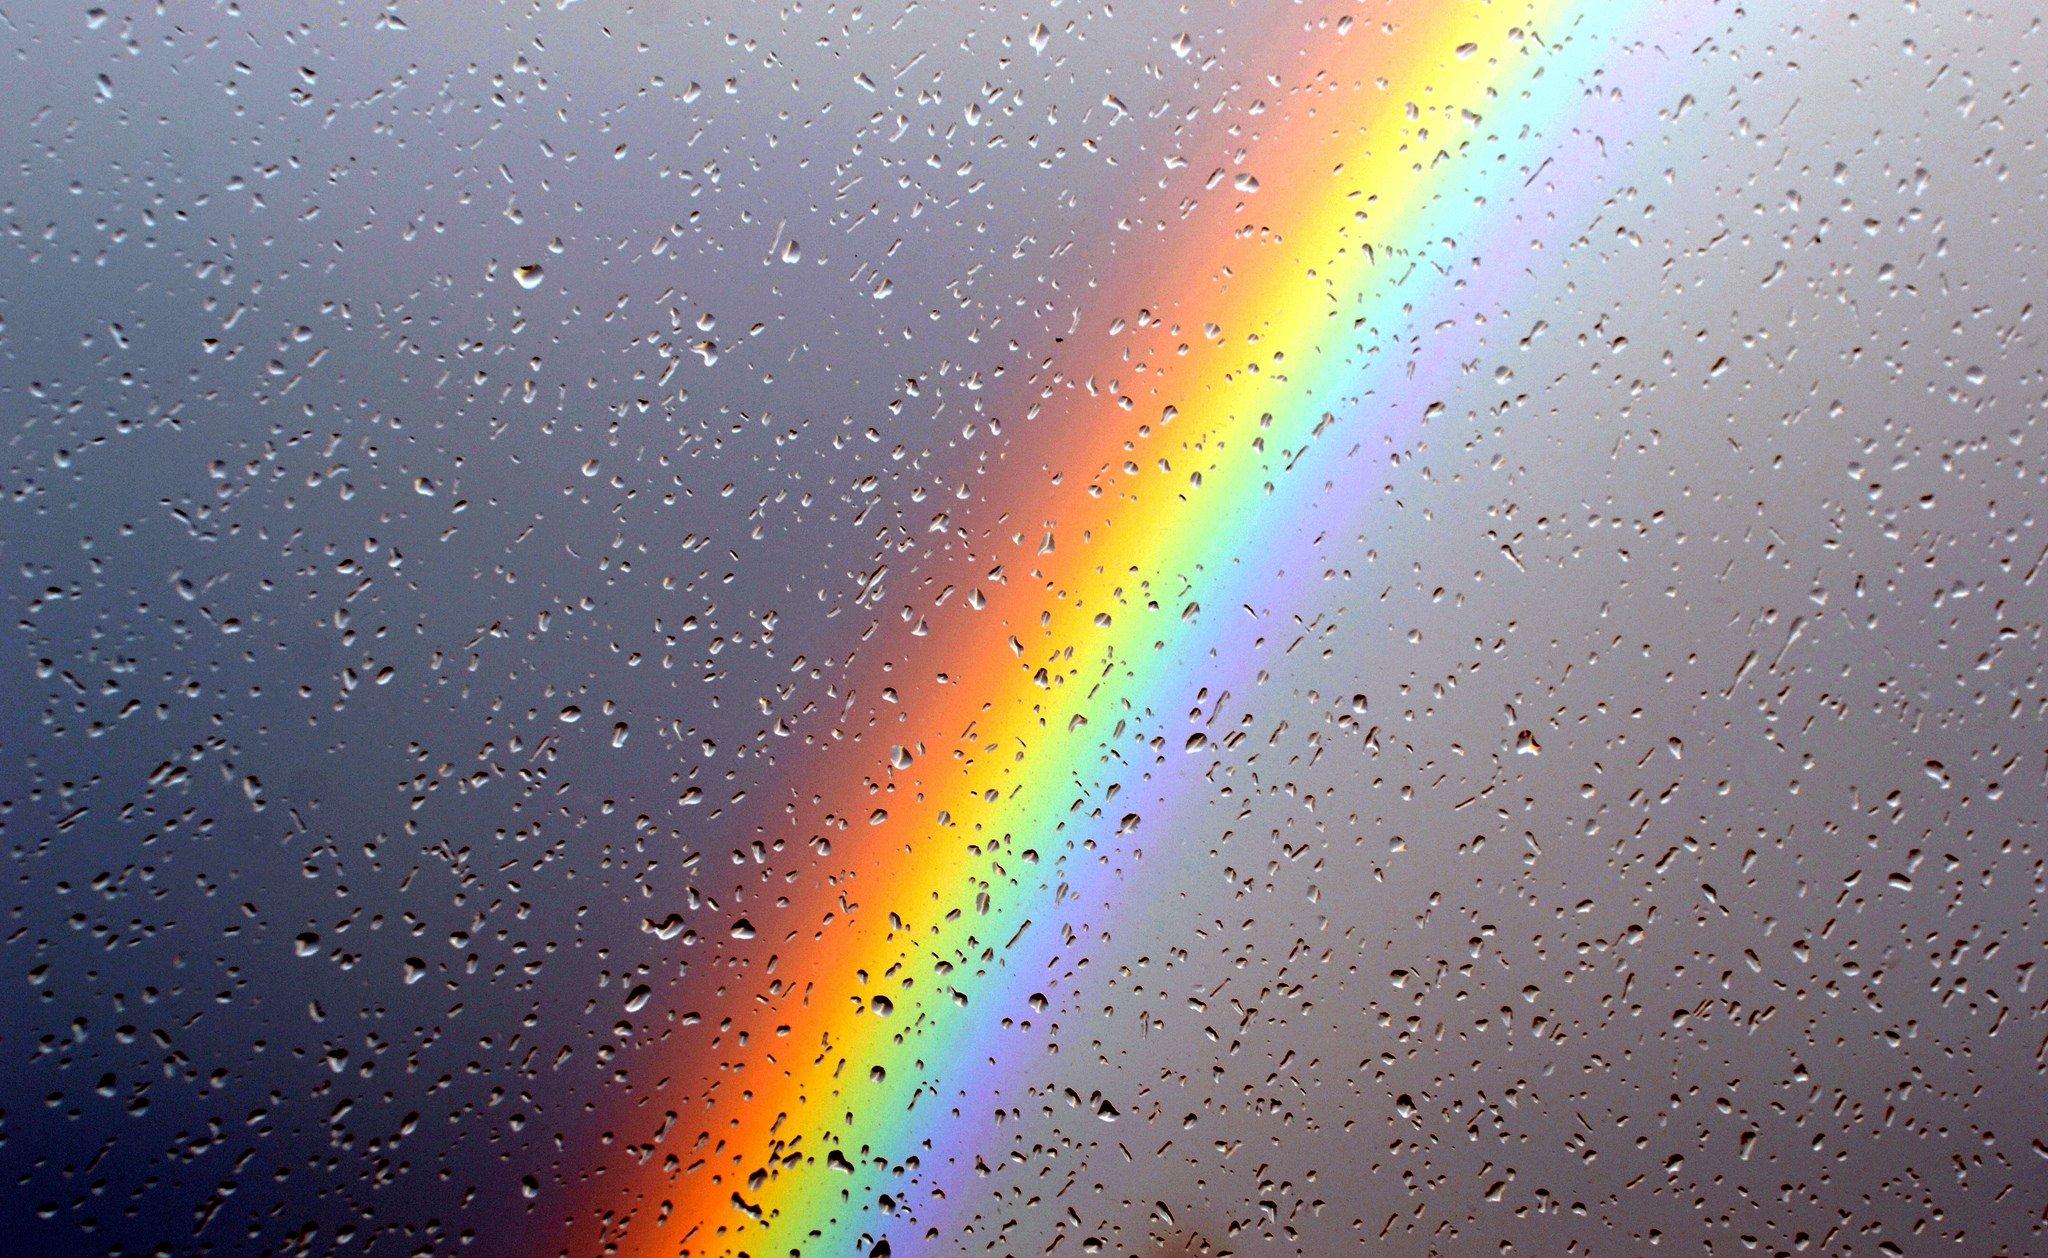 Wallpaper : 2048x1258 px, hujan, pelangi, tetes air ...